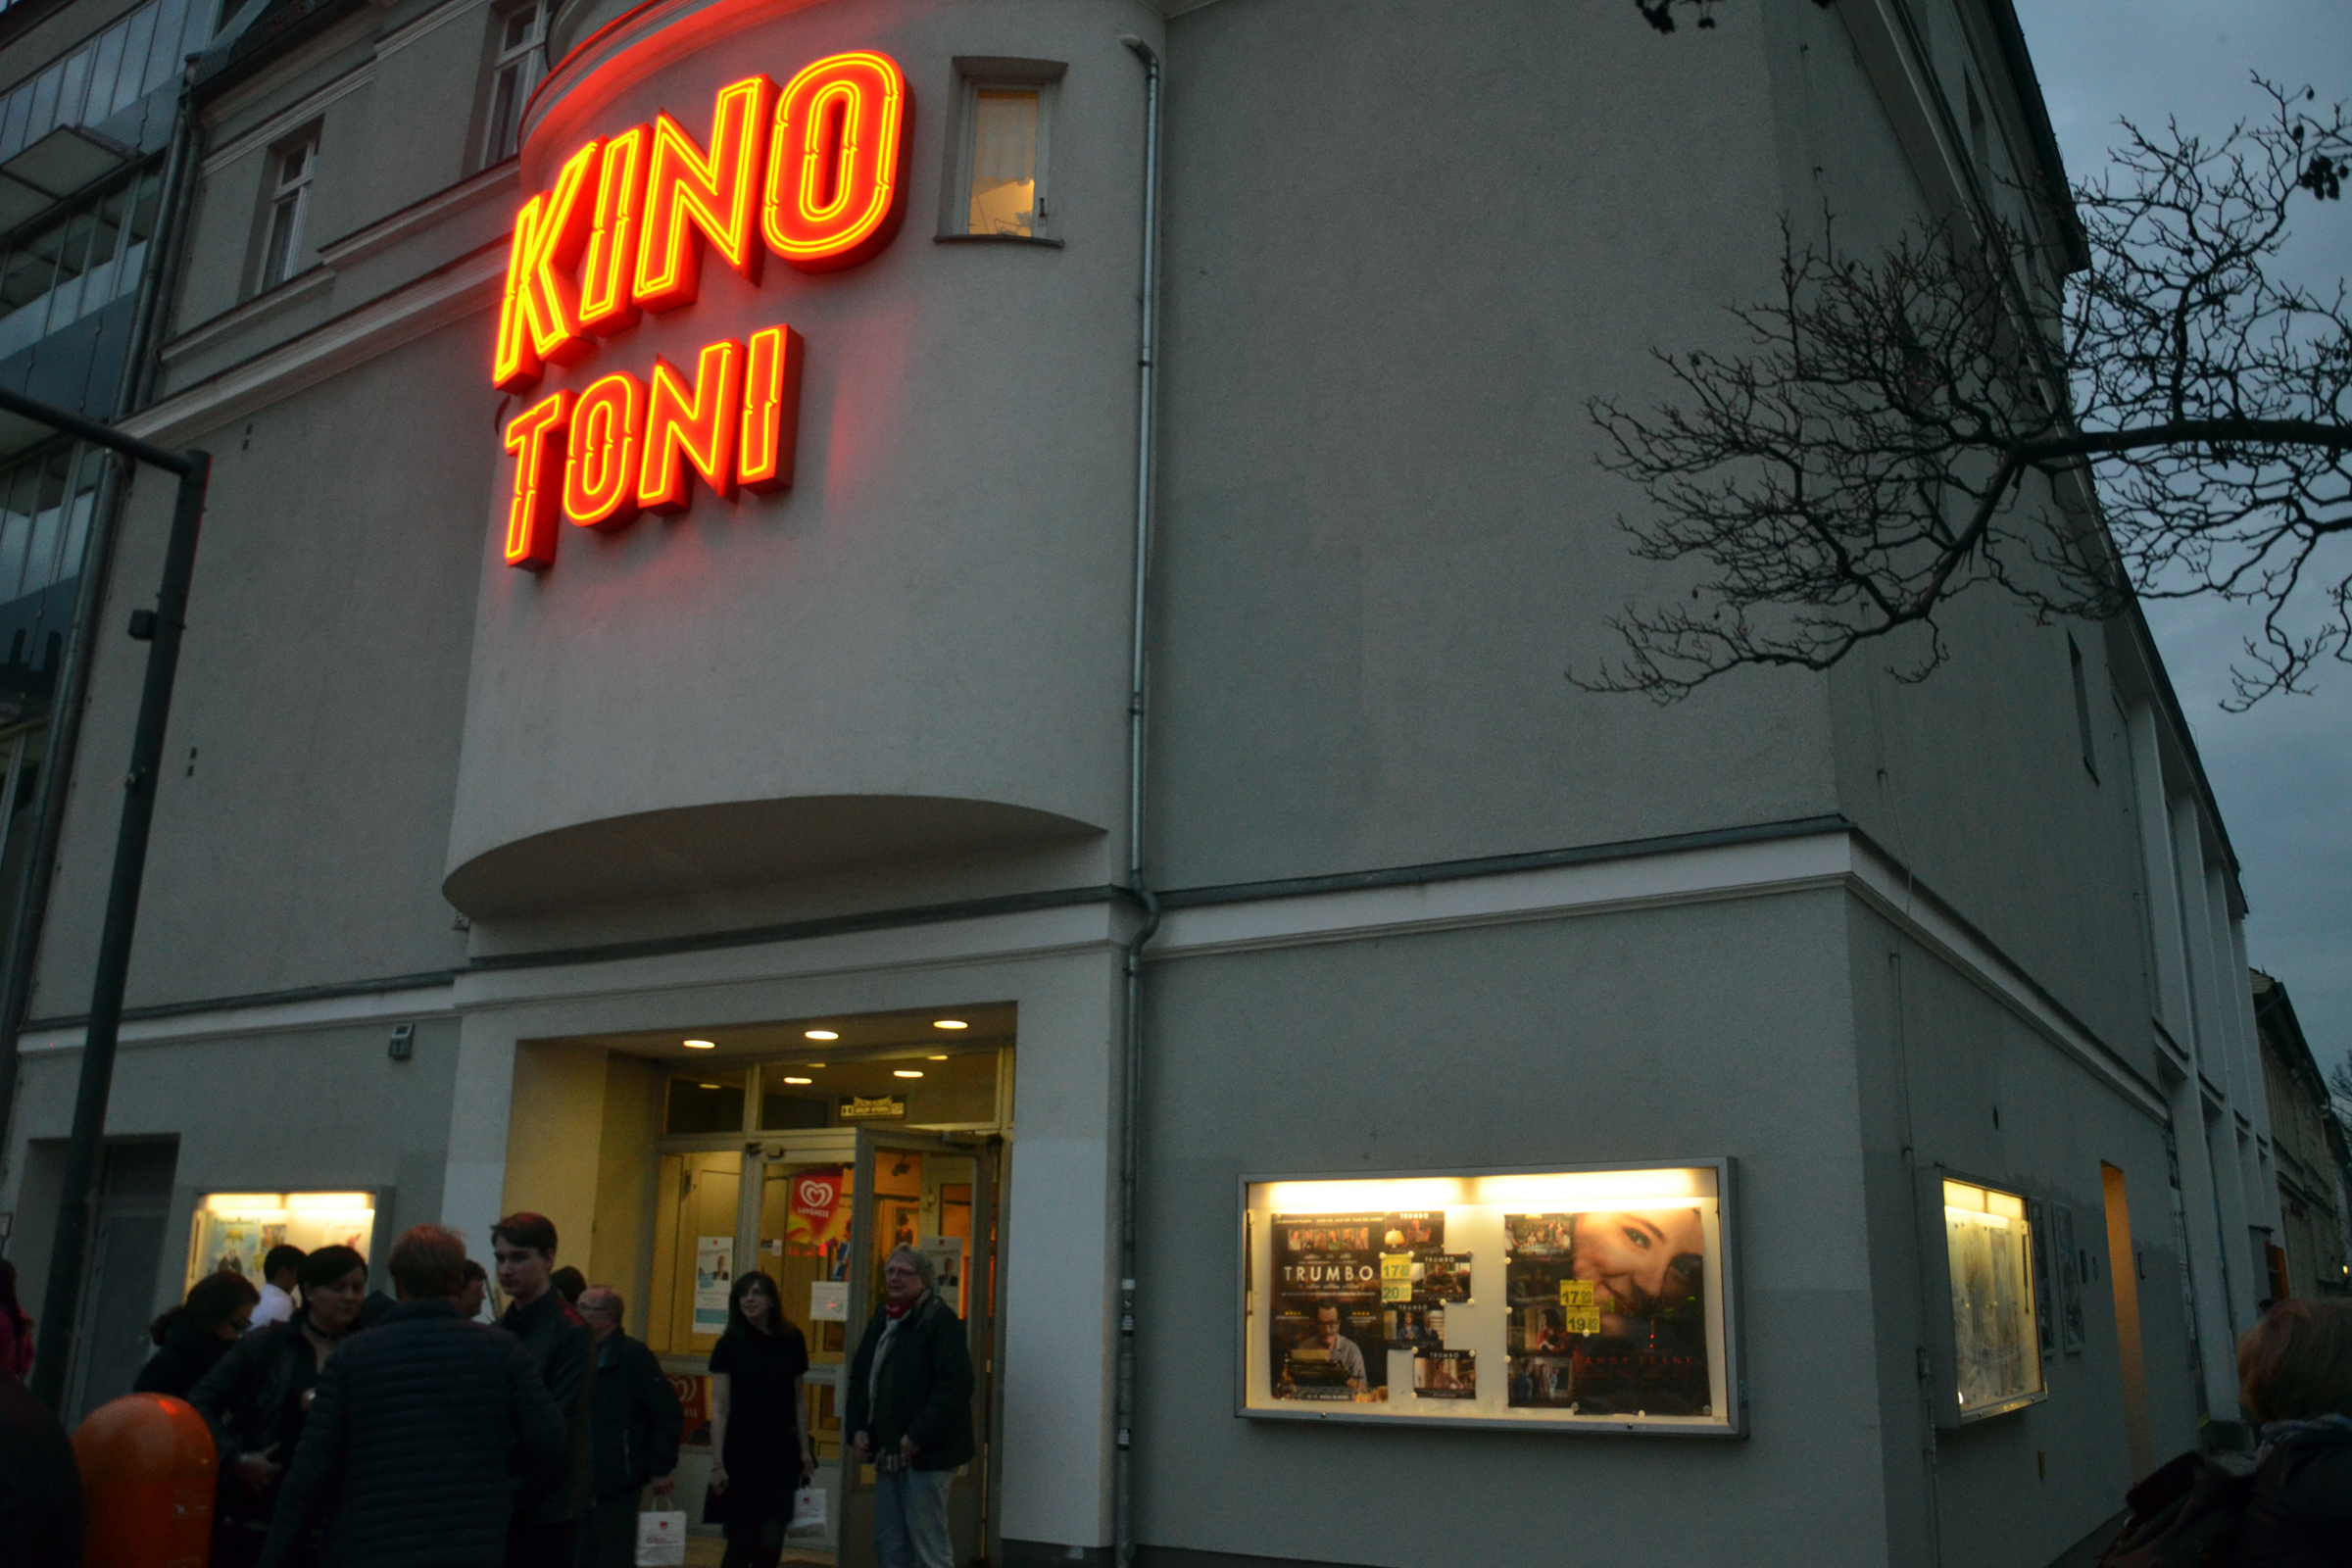 Eingang zum Kino Toni. Foto: Ulrich Horb